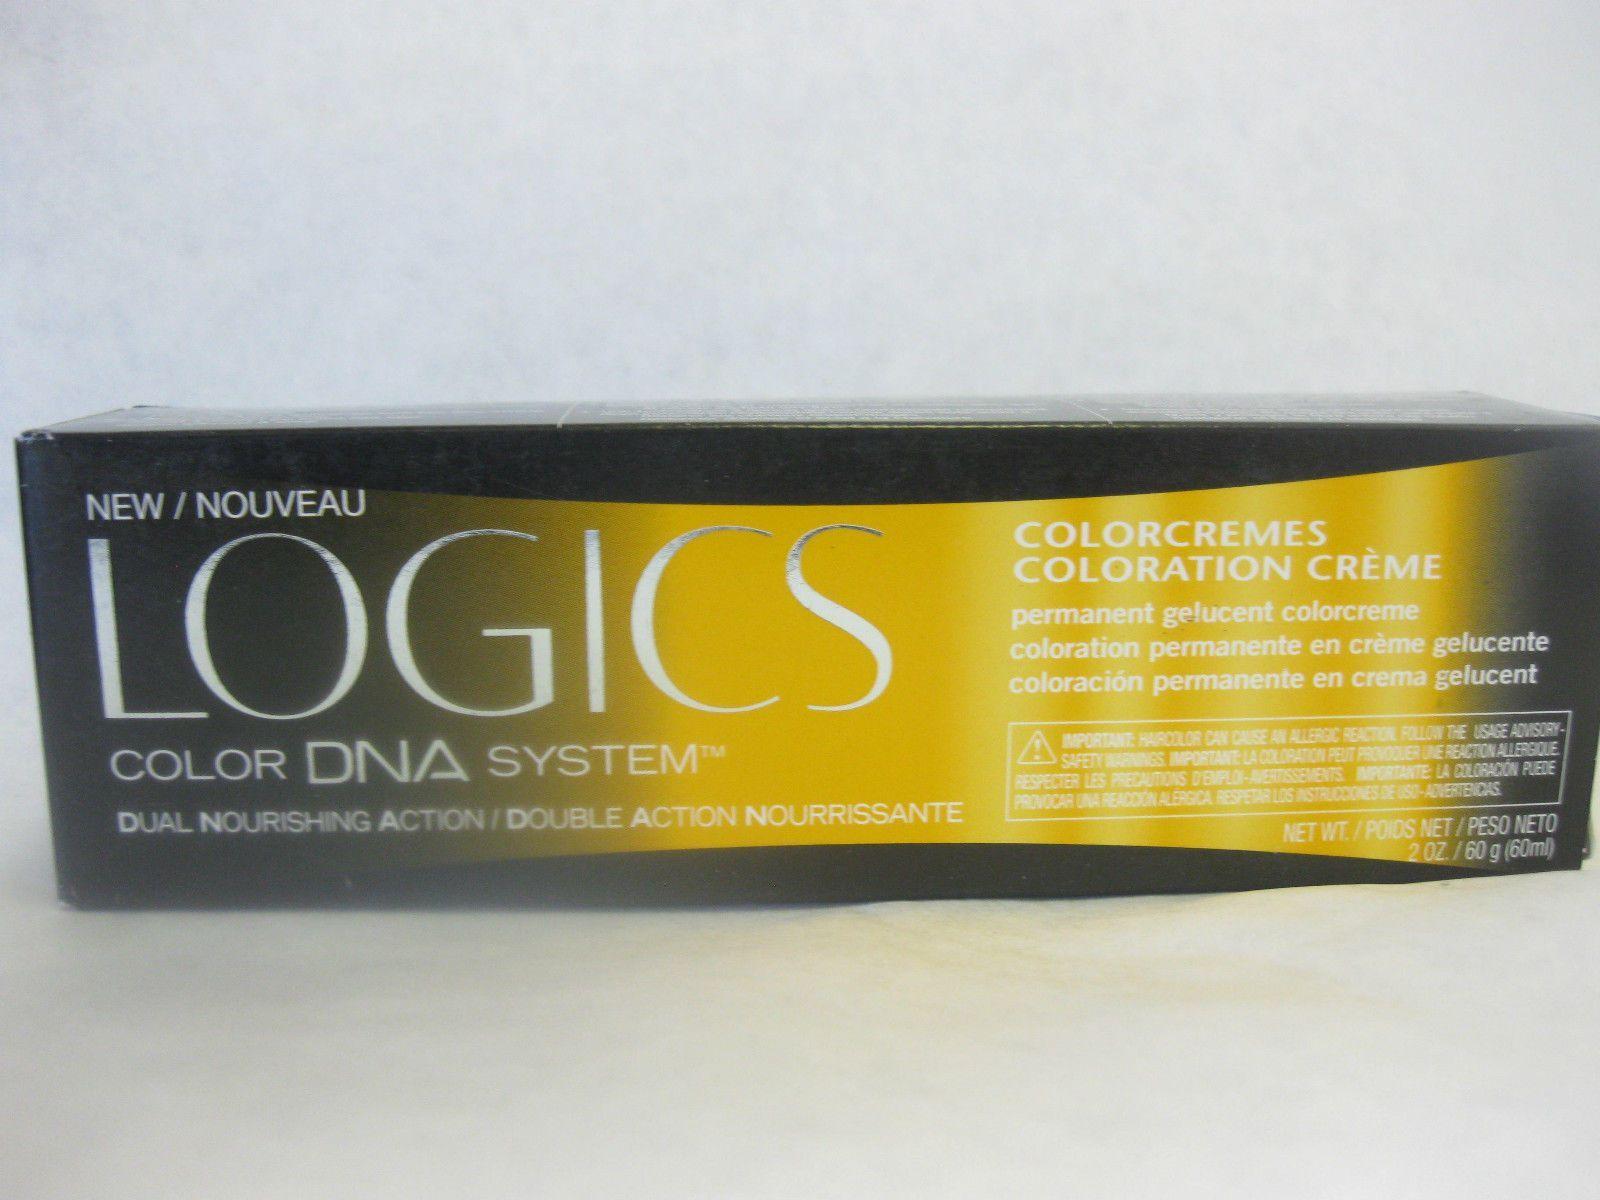 Matrix Logics Dna Colorcremes Permanent Hair Color Yellow Box